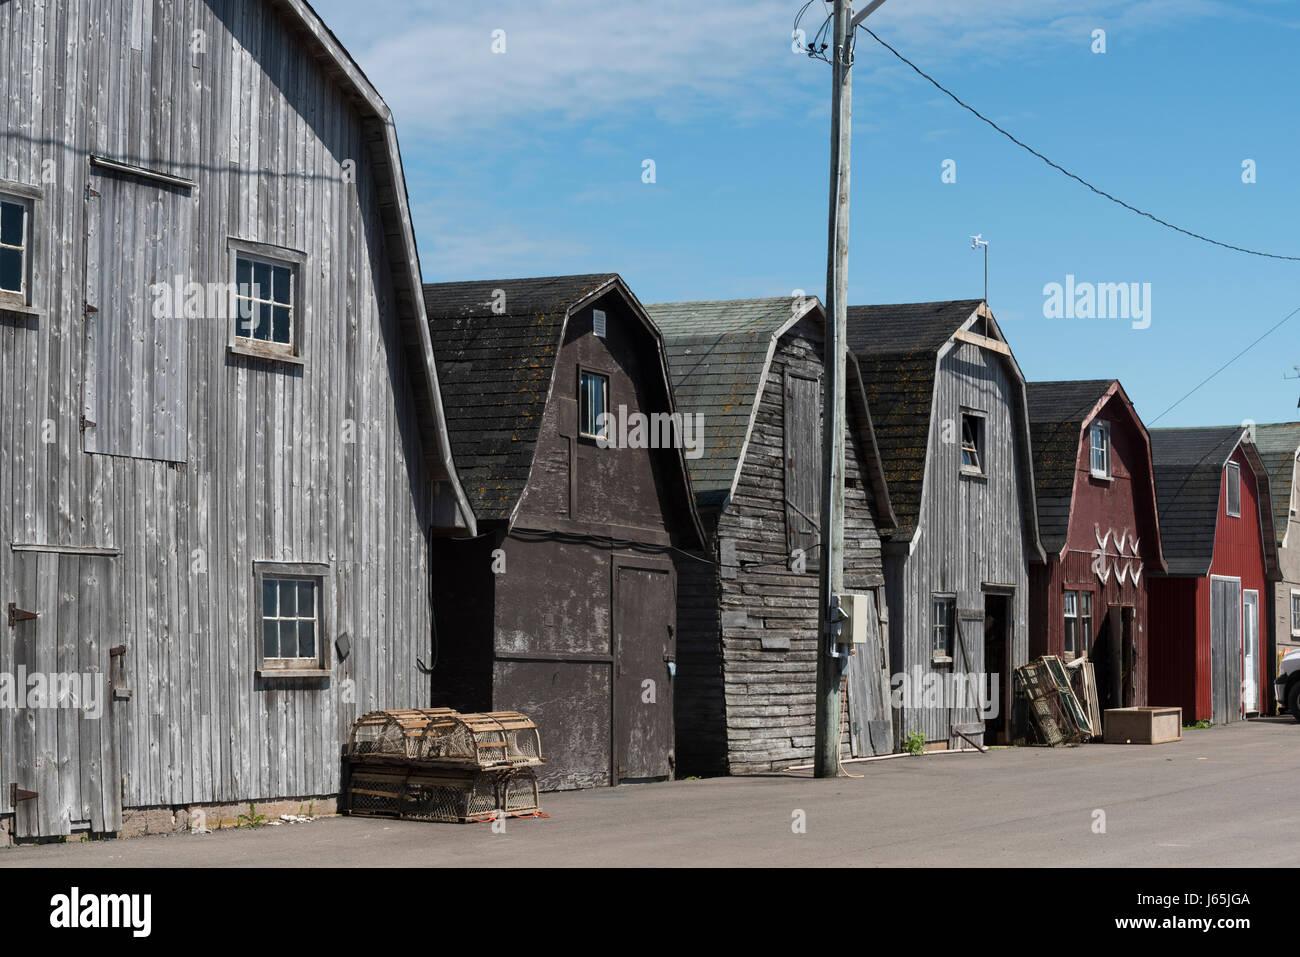 Fishing sheds at harbor, Lot 18, Prince County, Prince Edward Island, Canada - Stock Image